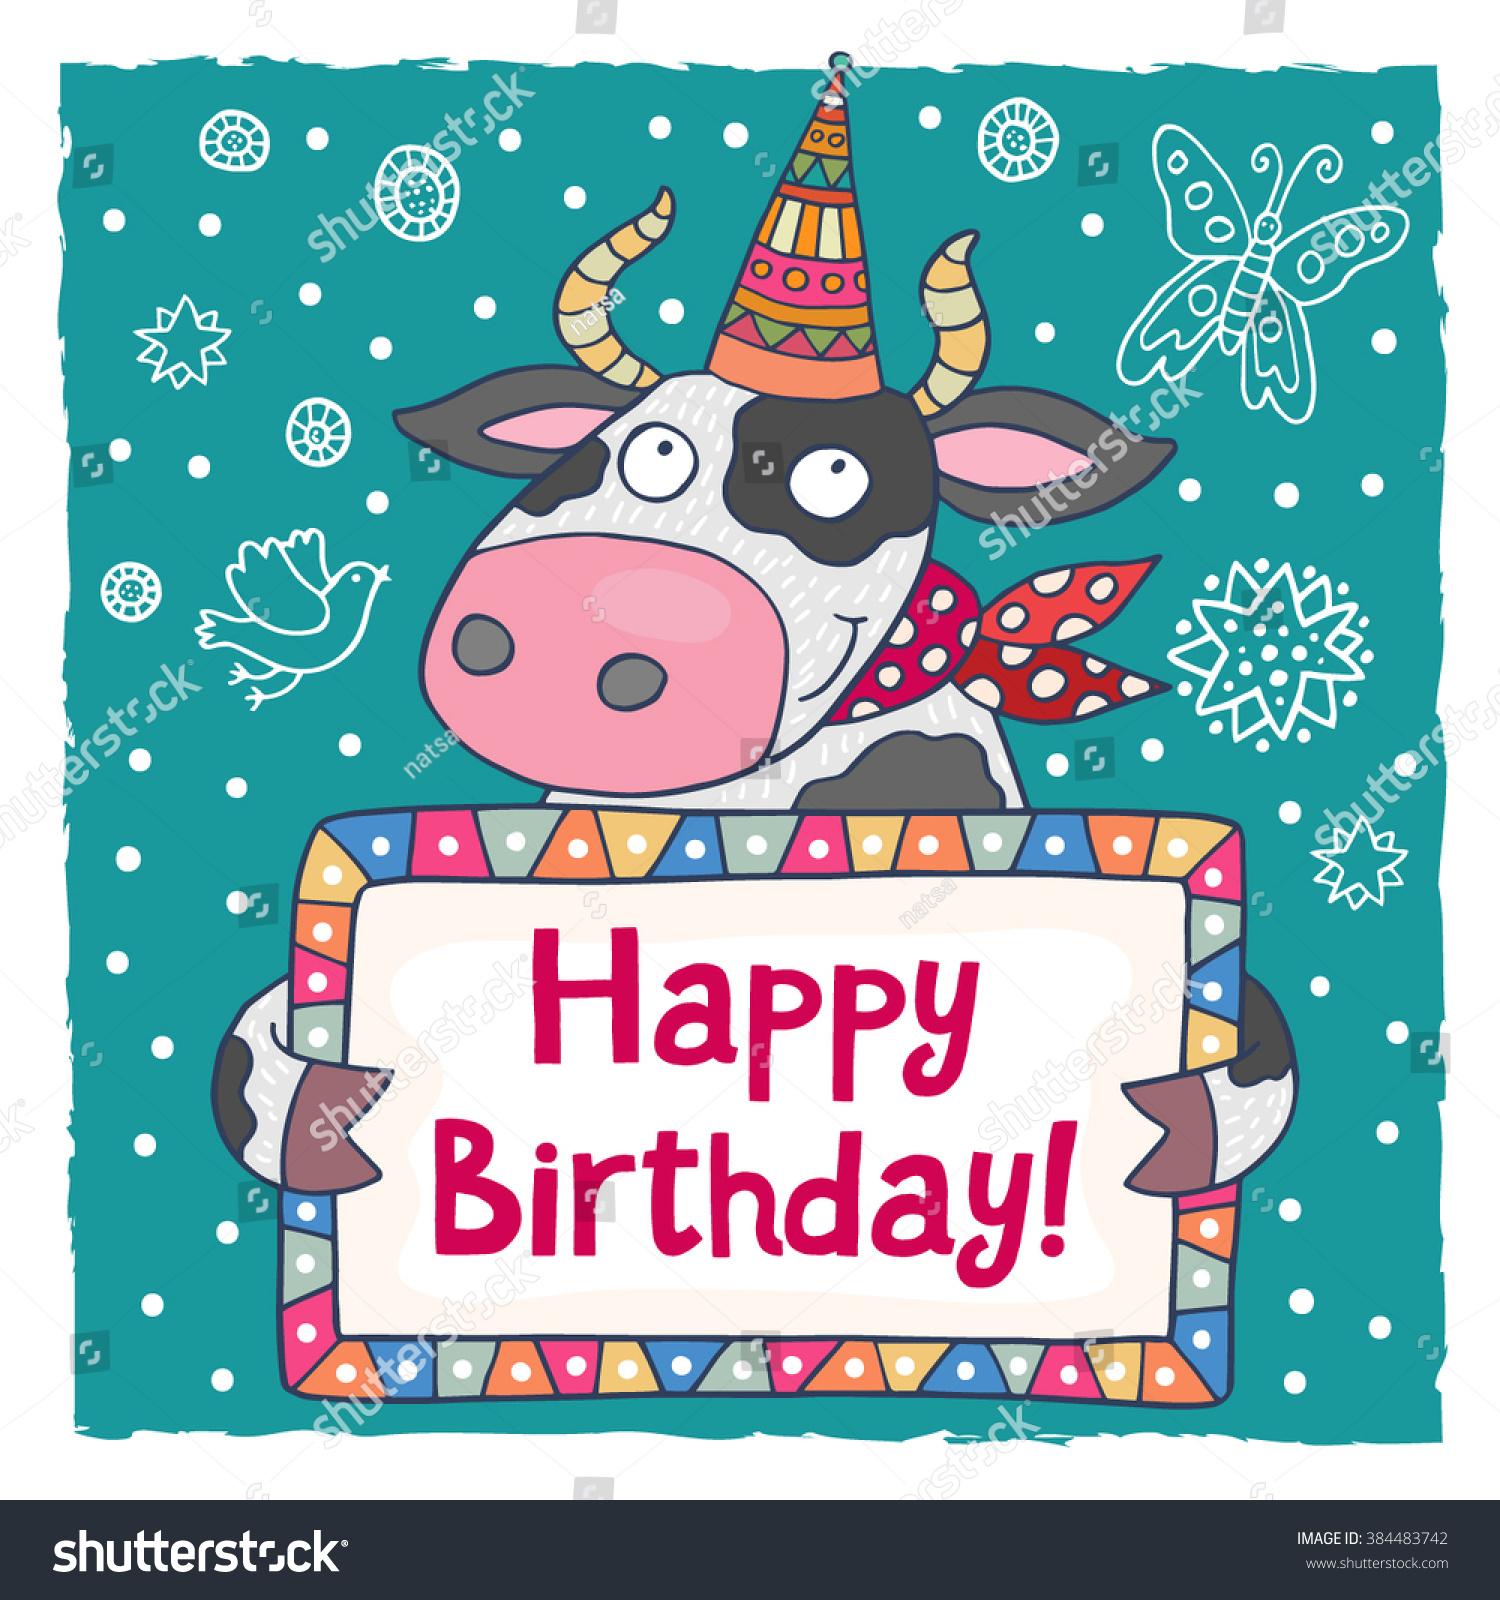 Cute Happy Birthday Greeting Card Template Vector 384483742 – Template Happy Birthday Card